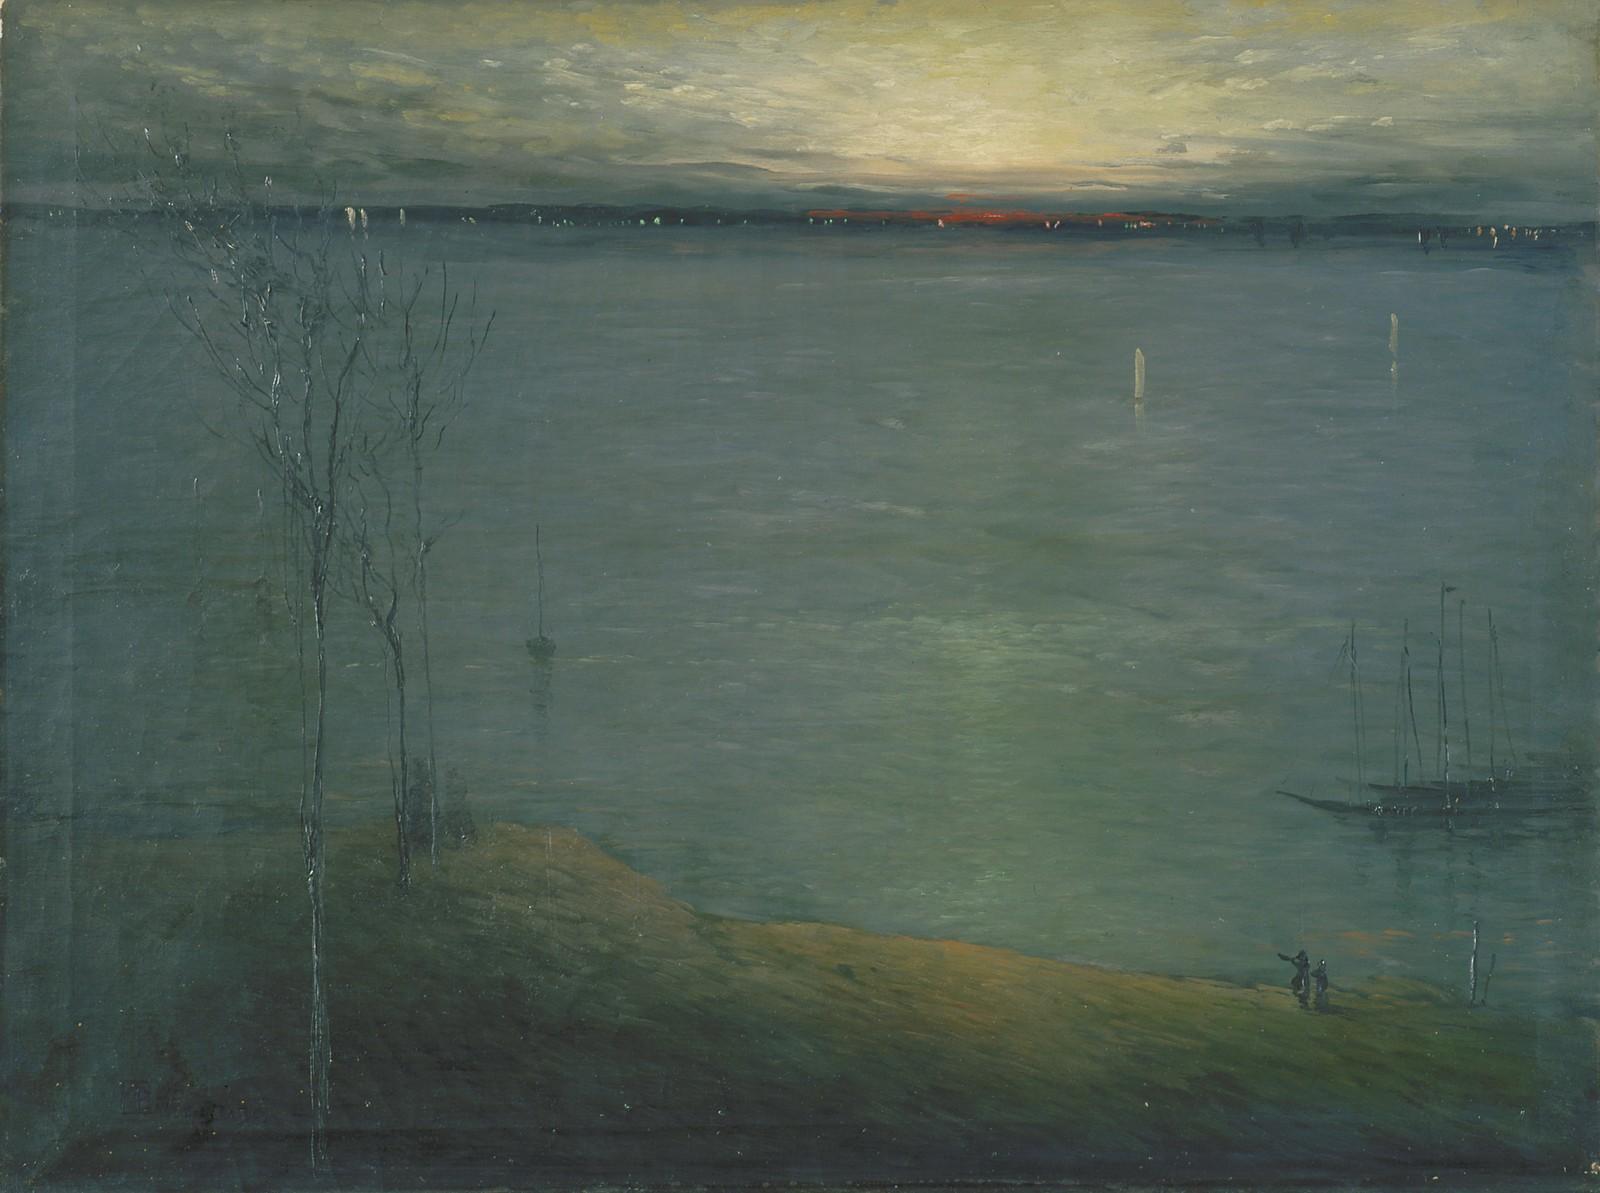 19th Century American Paintings Leon Dabo